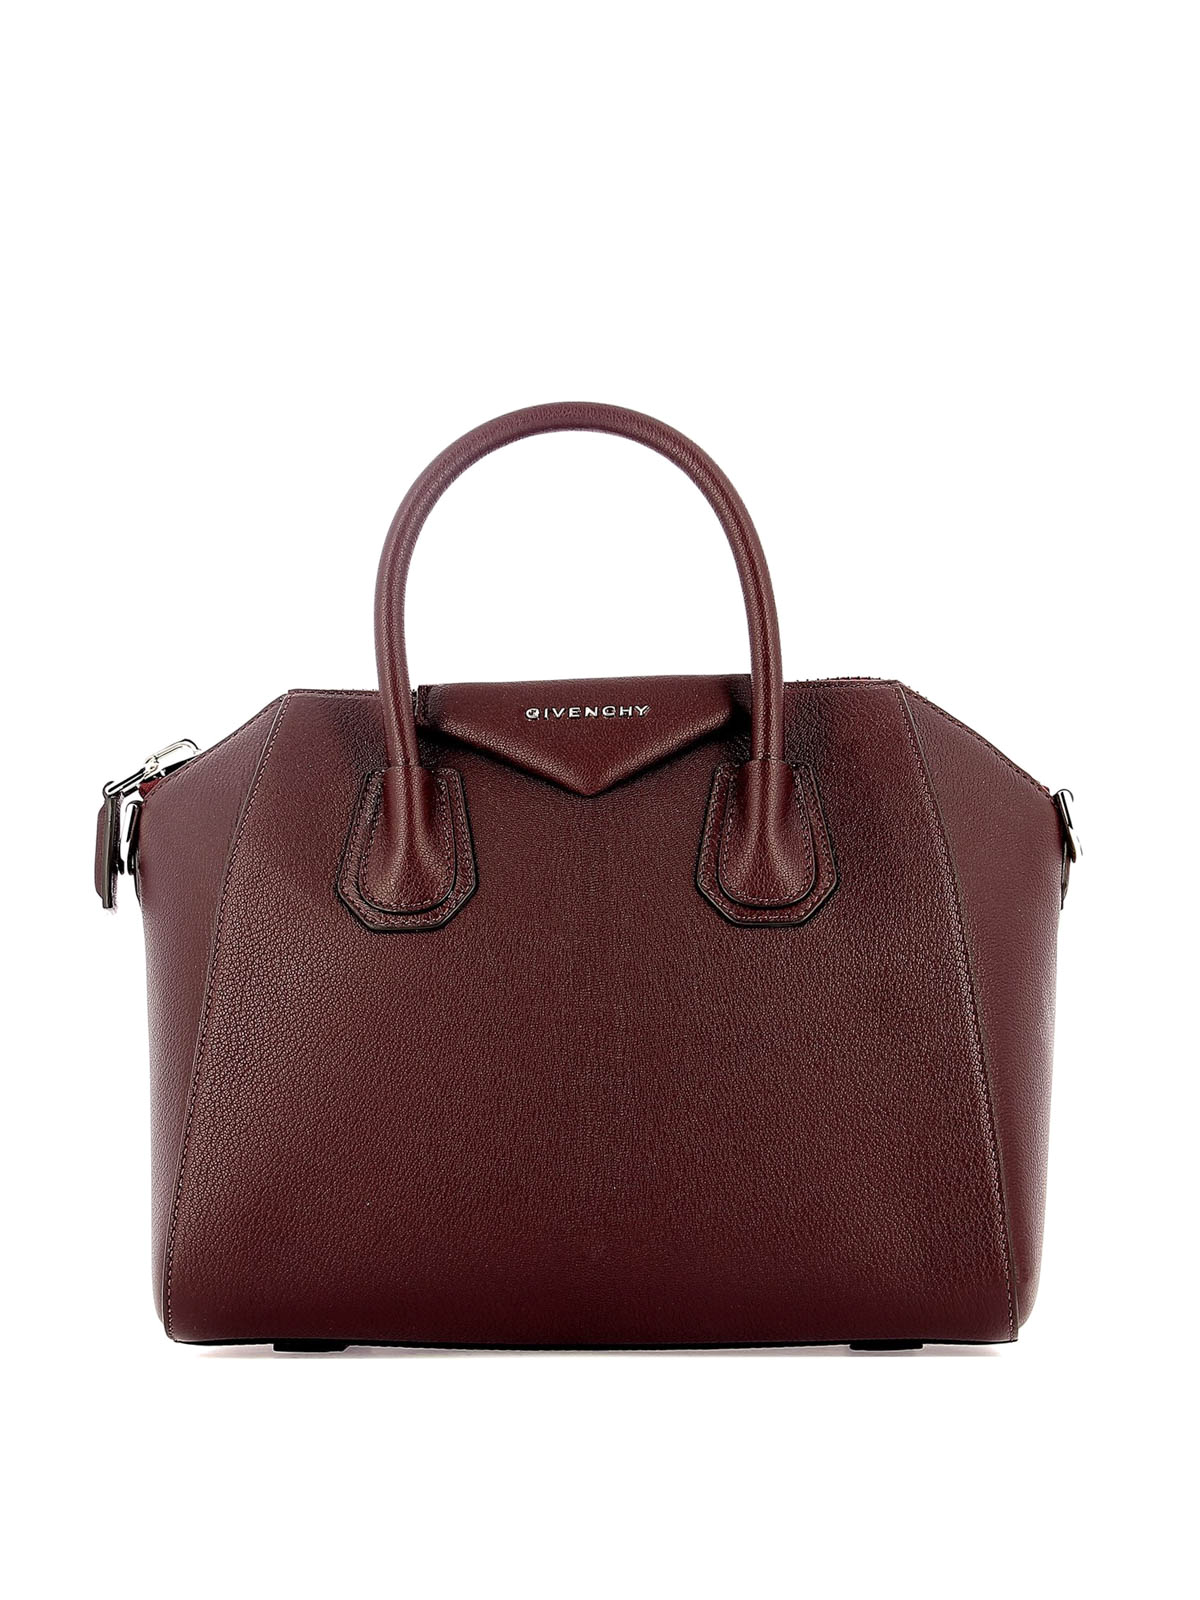 57feb227a5f Givenchy - Antigona aubergine leather small handbag - bowling bags ...